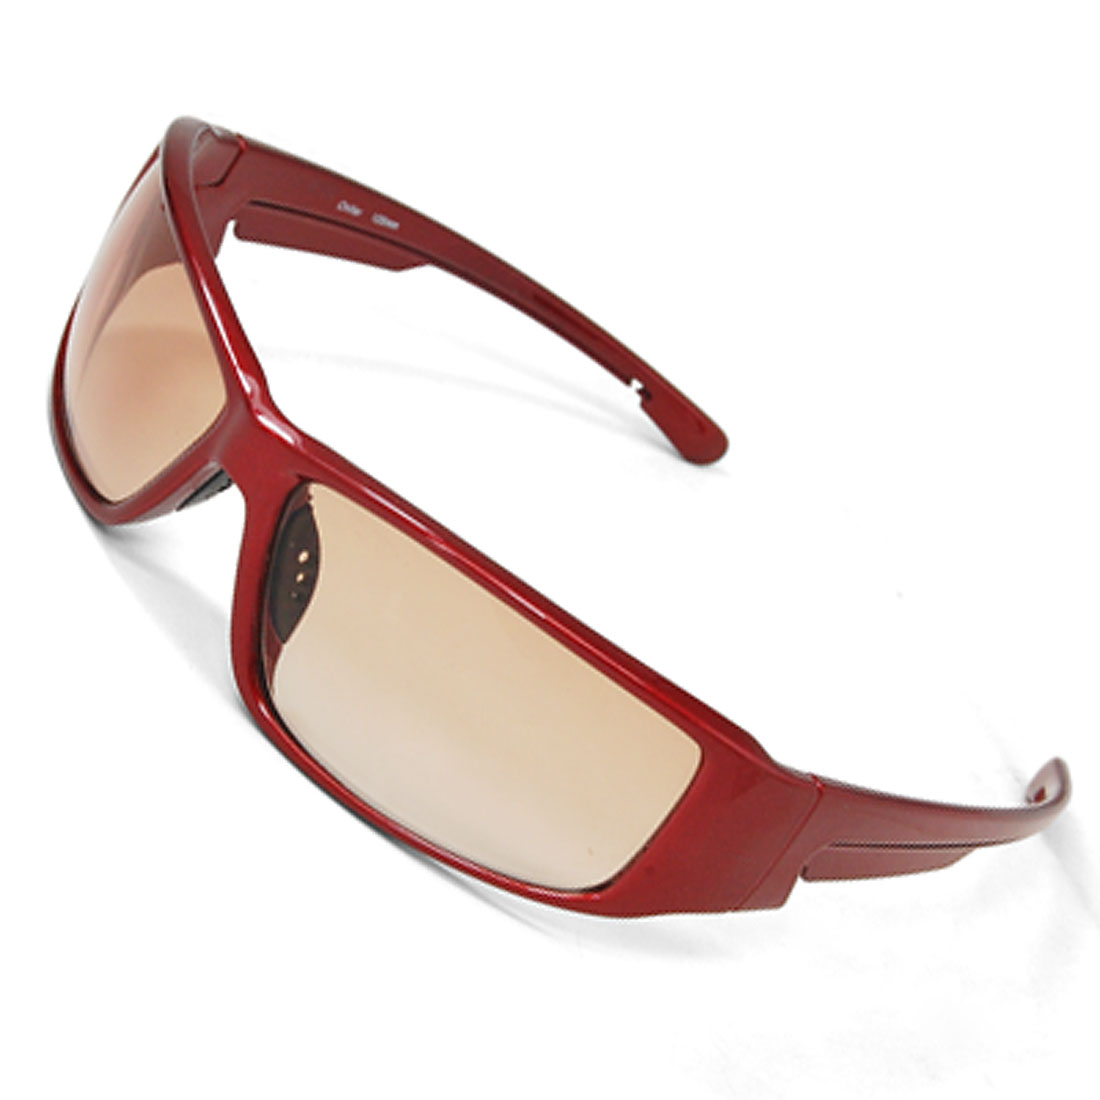 Unisex Plastic Arm Big Lens Full-rim Frame Sports Sunglasses